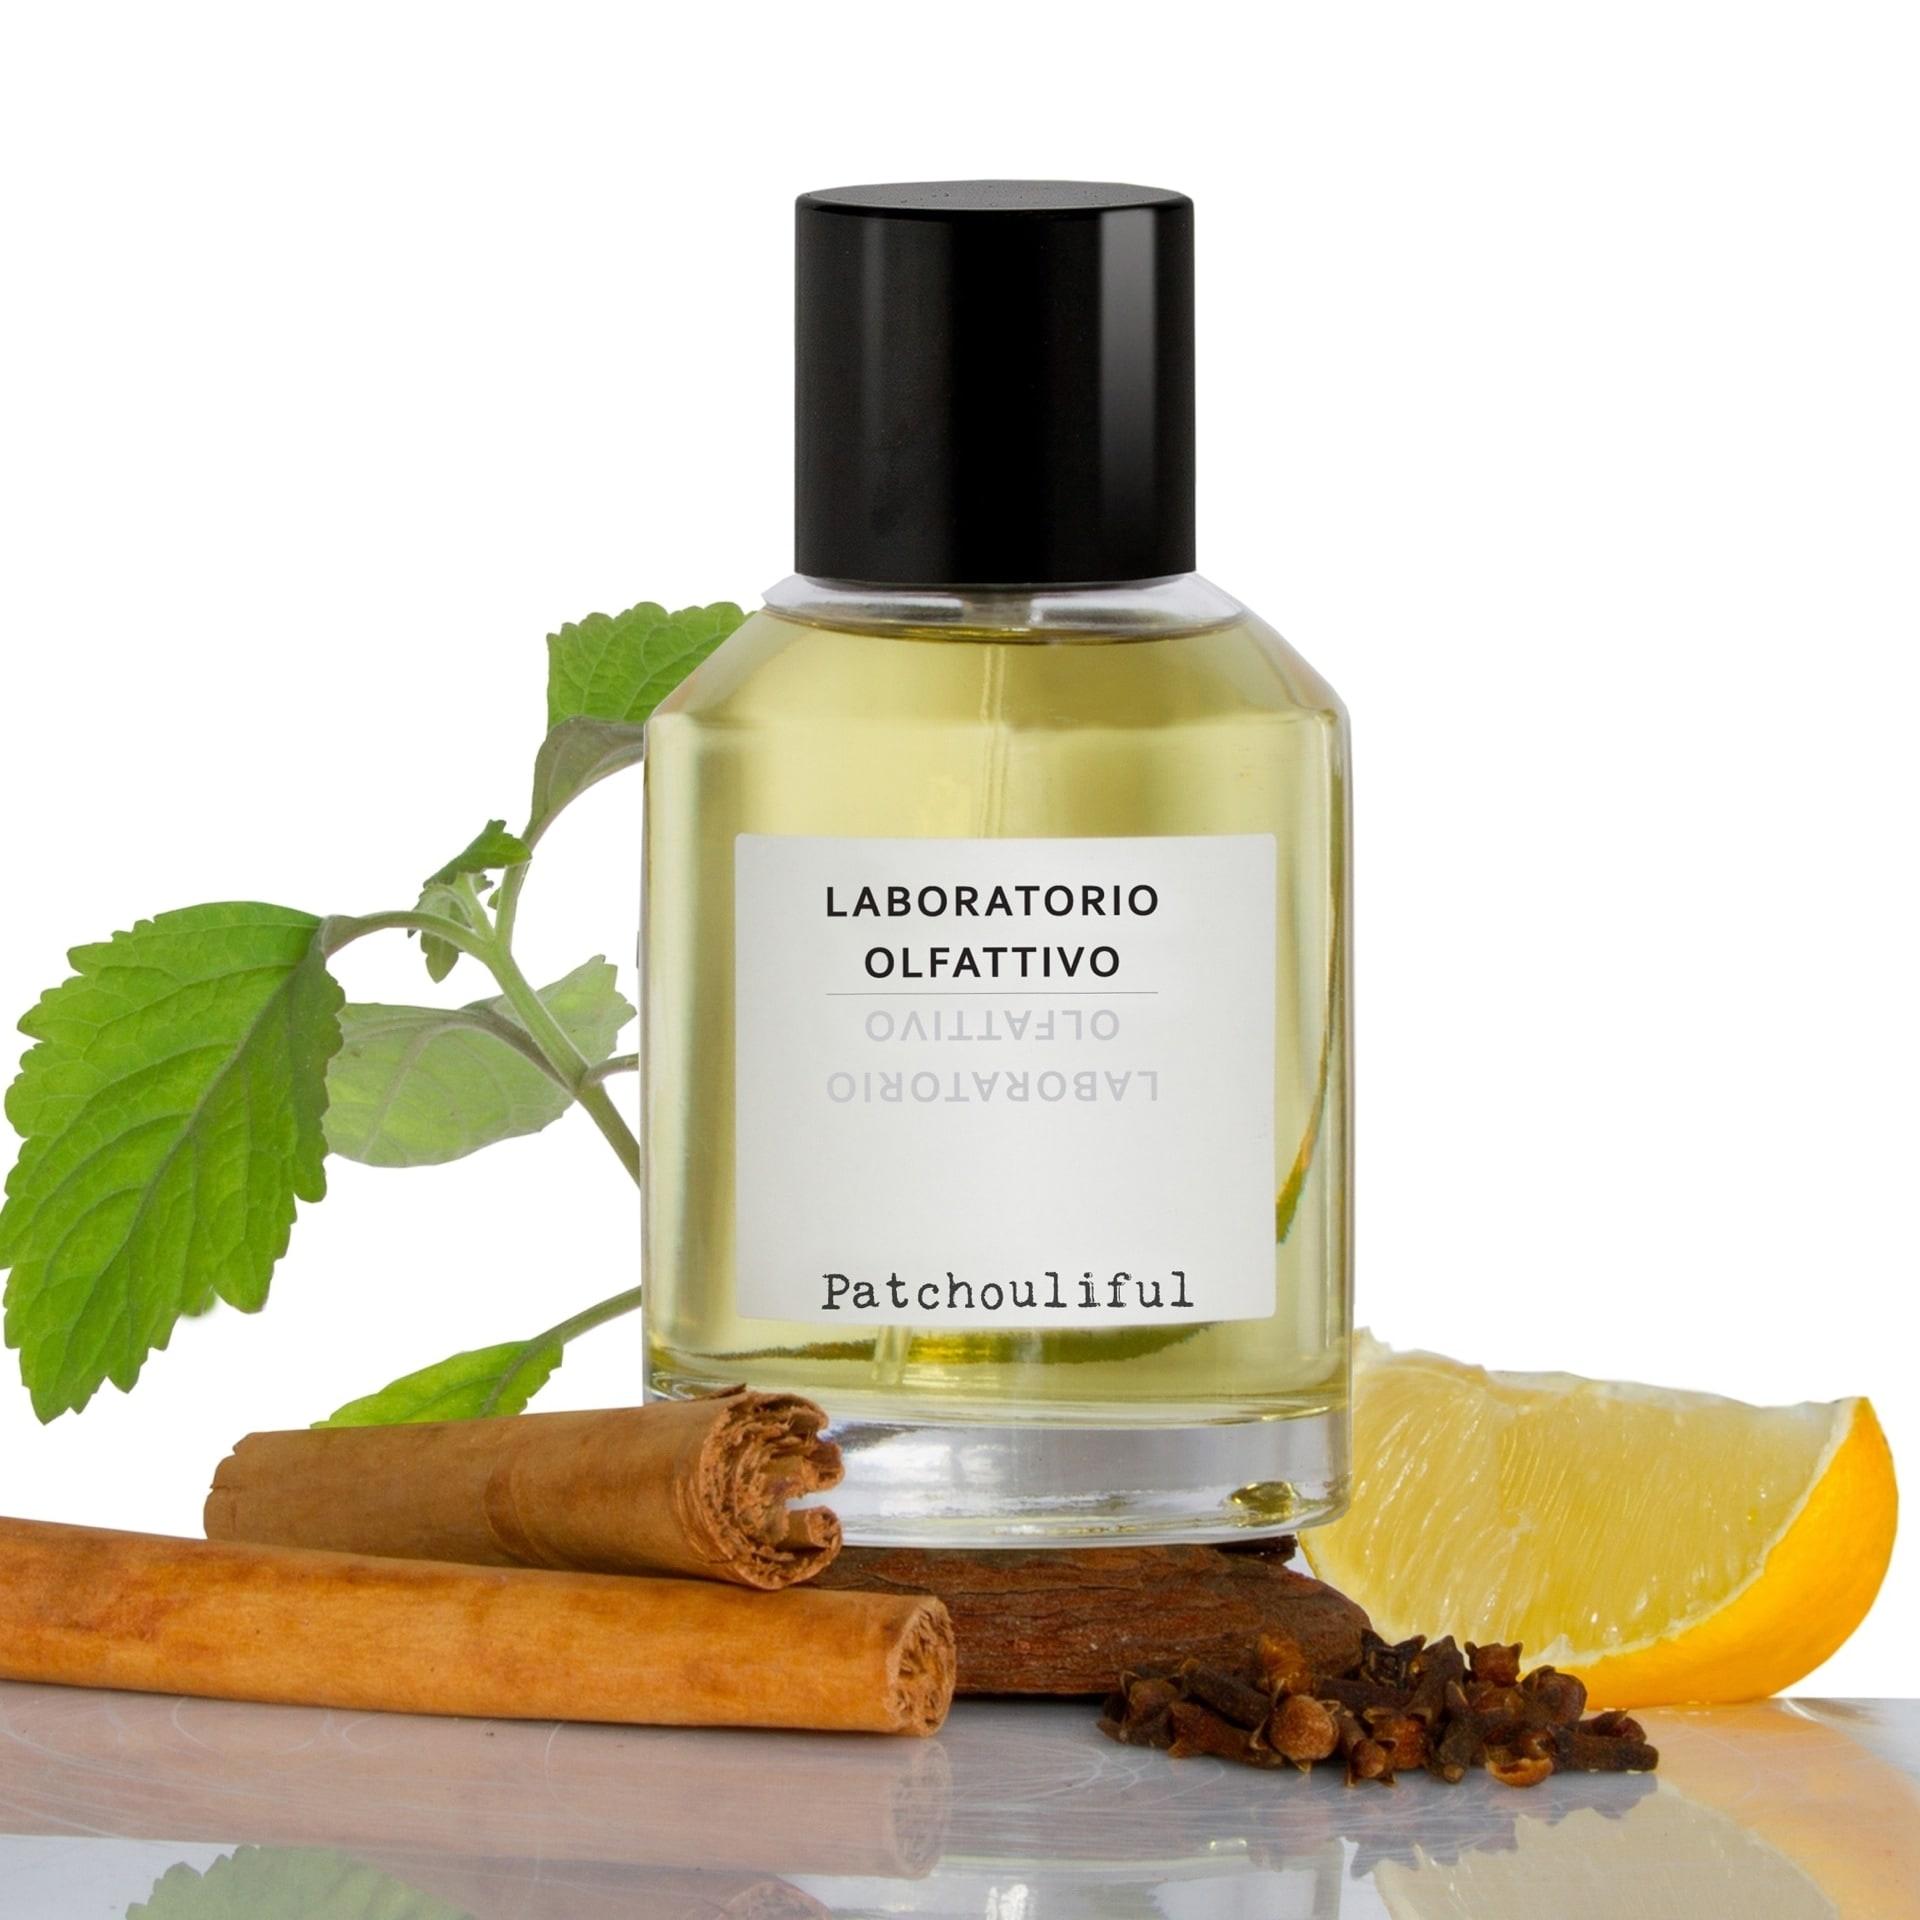 Парфюмированная вода Laboratorio Olfattivo Patchouliful